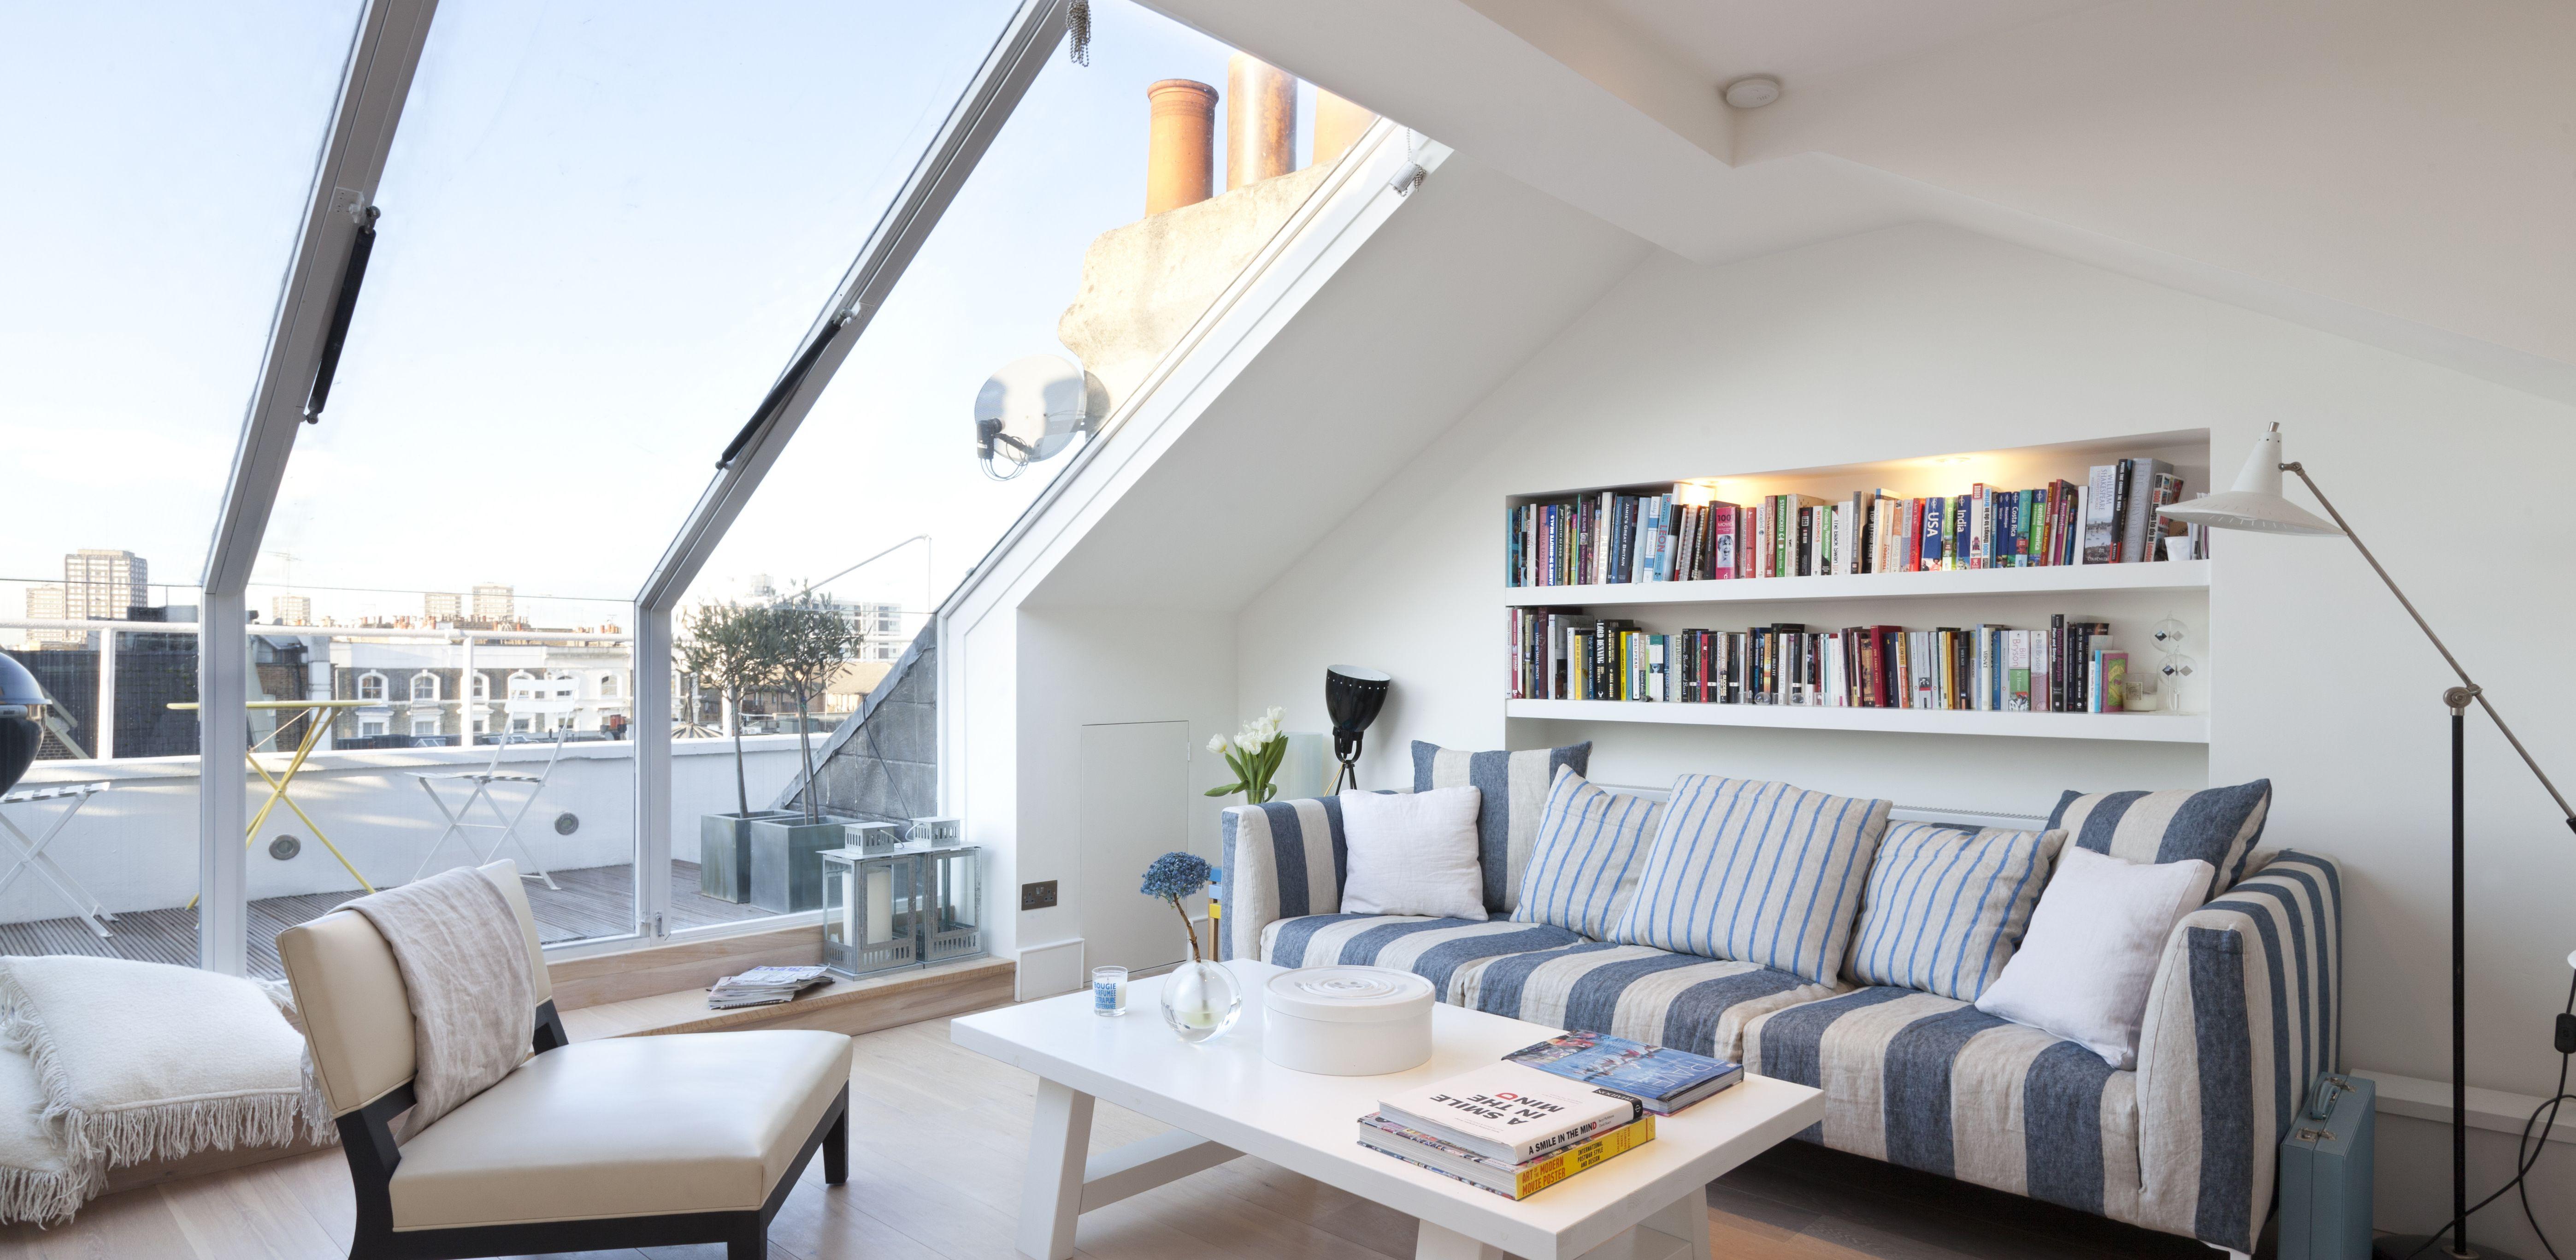 Penthouse apartment on Portobello Road London Amazing skylight